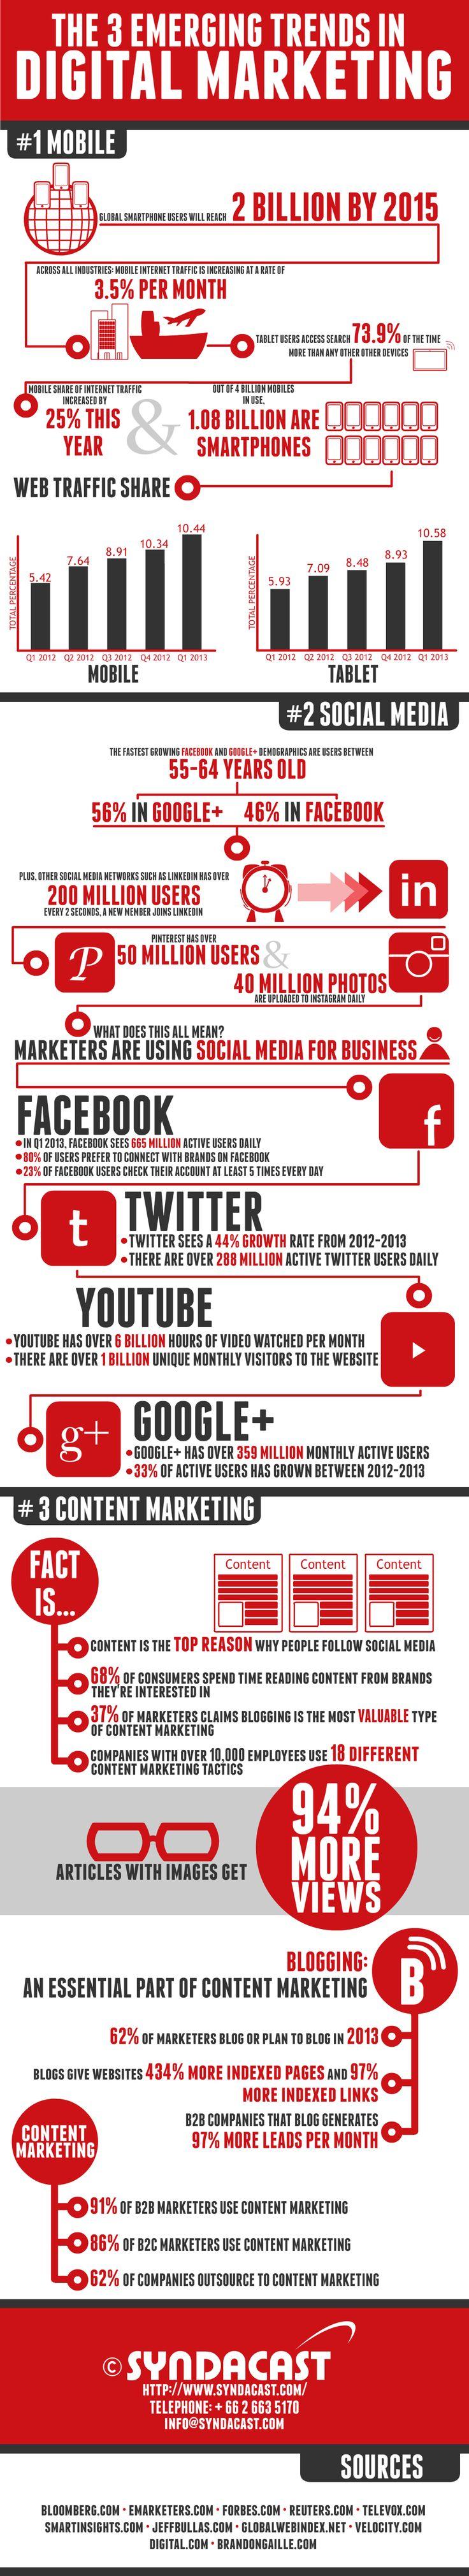 The Digital Marketing Infographic